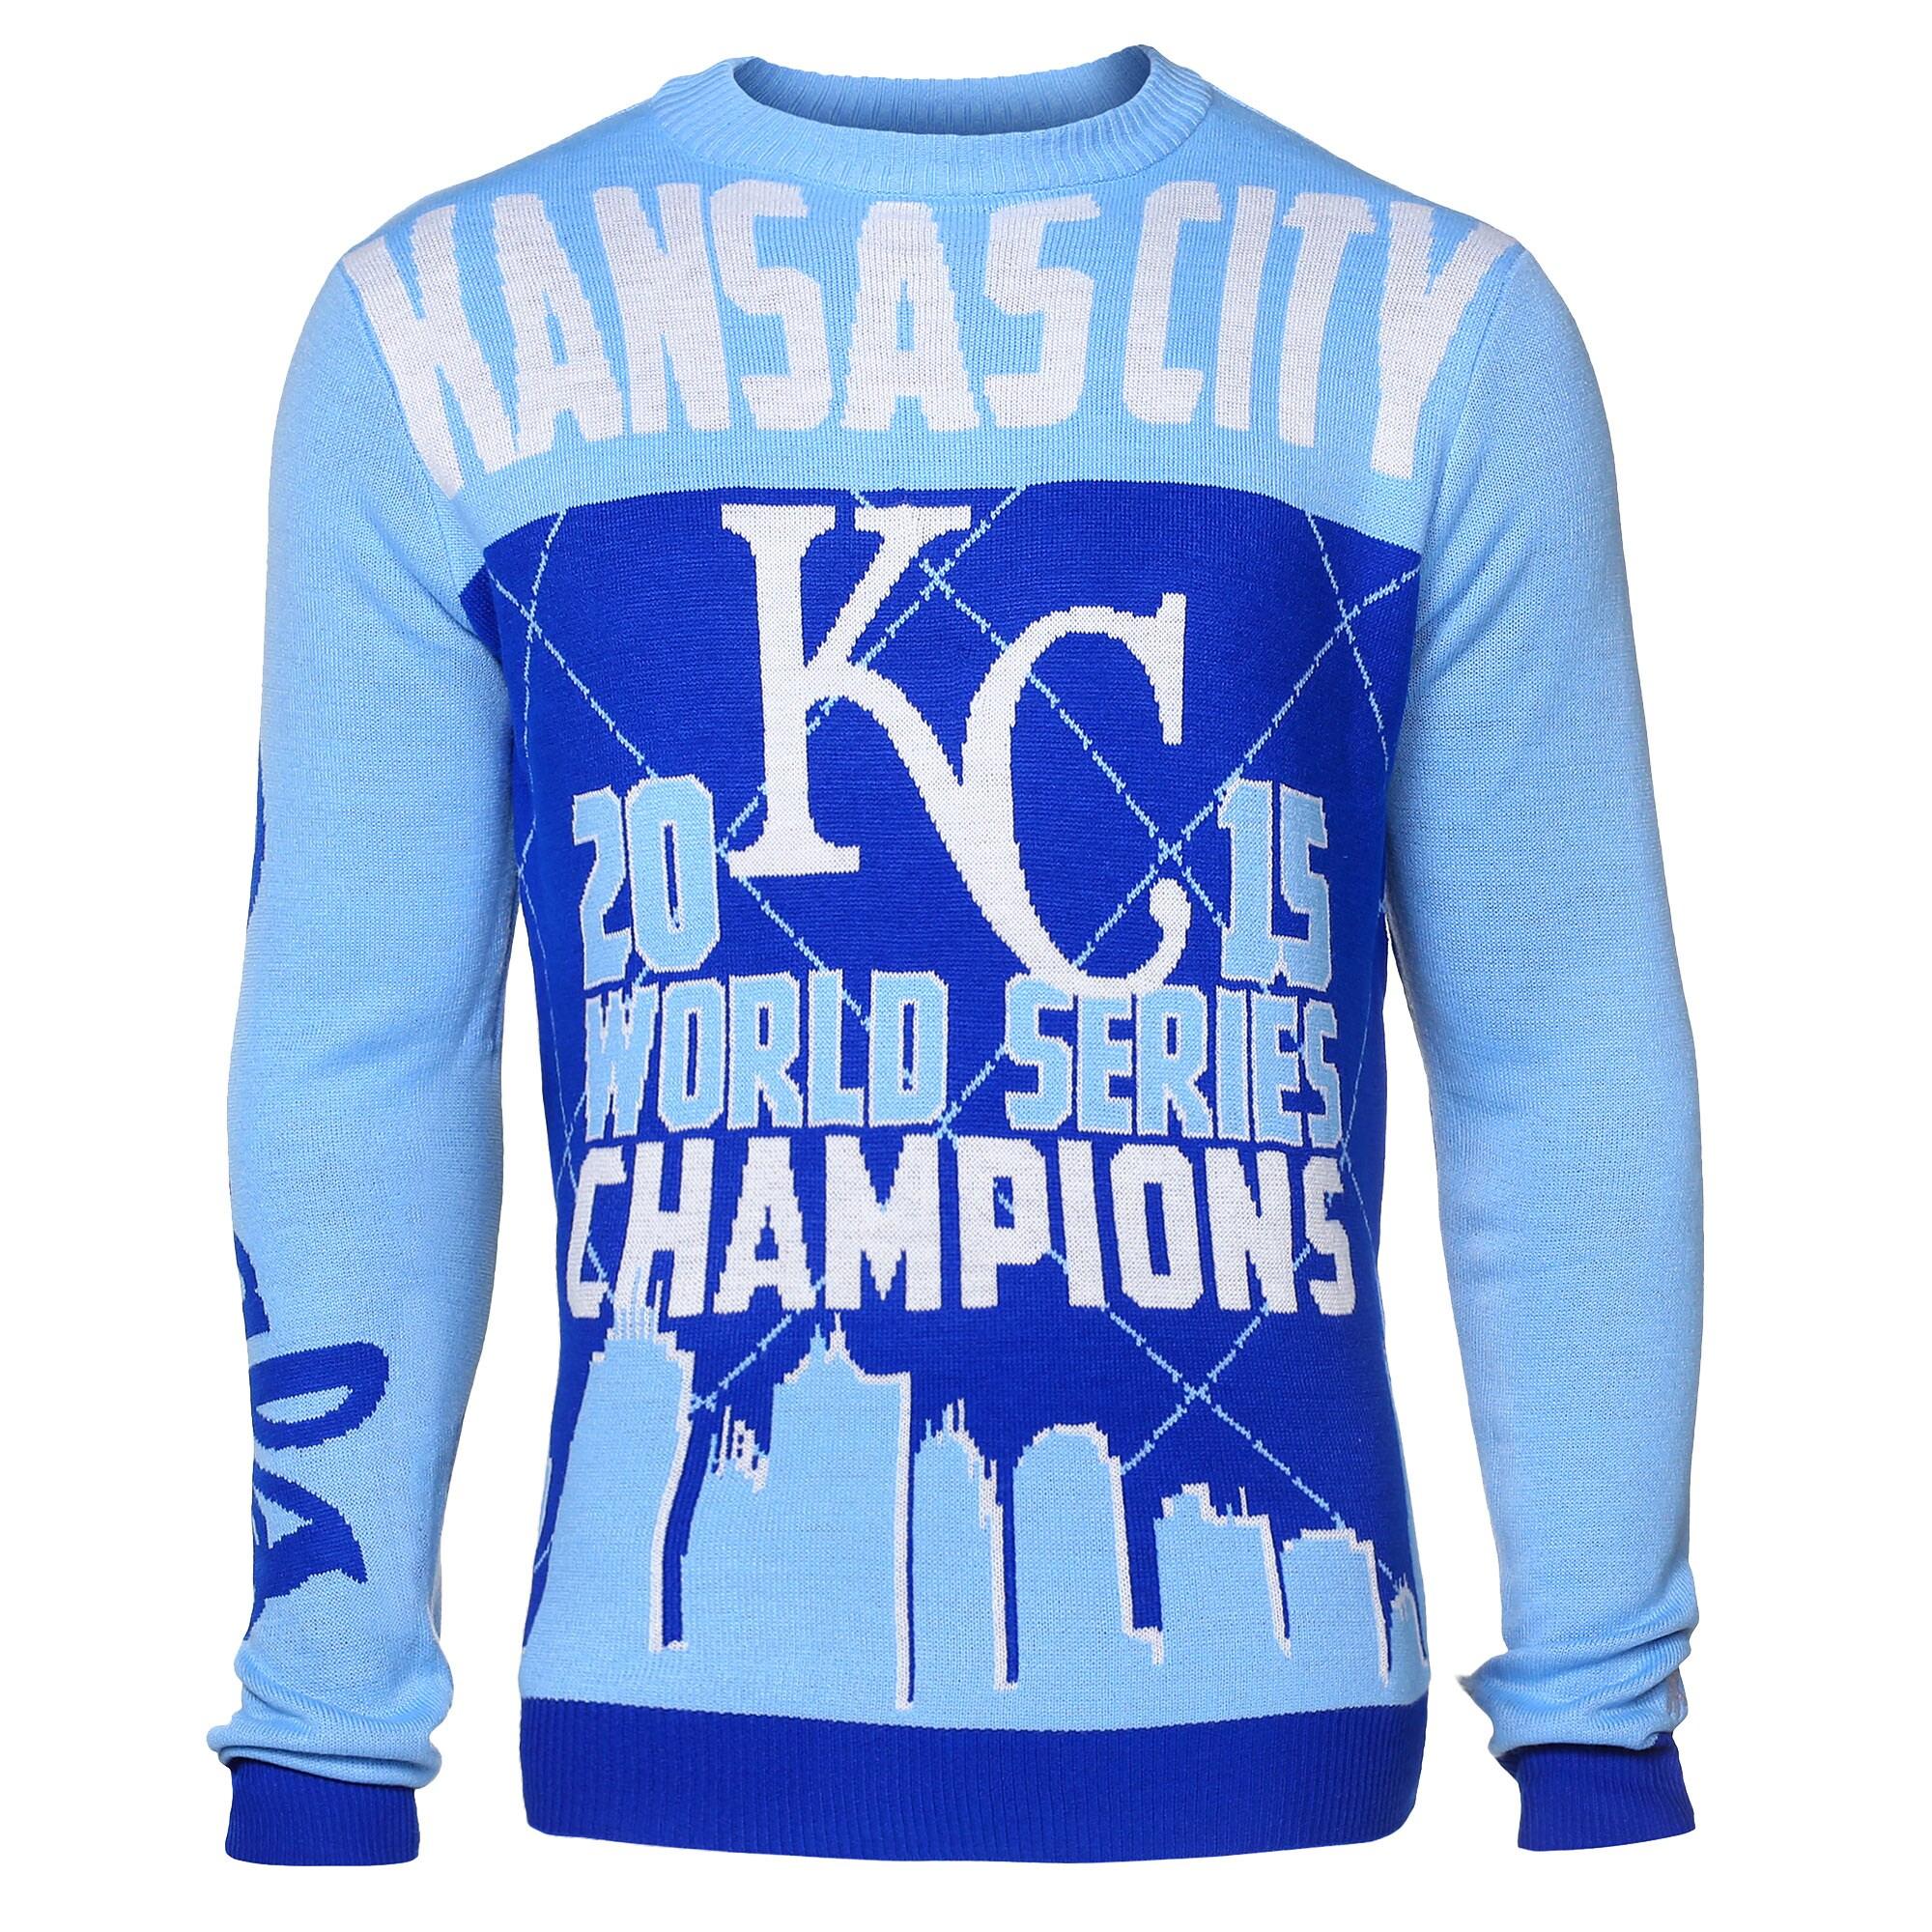 Kansas City Royals Klew 2015 World Series Champions Sweater - Light Blue/Royal